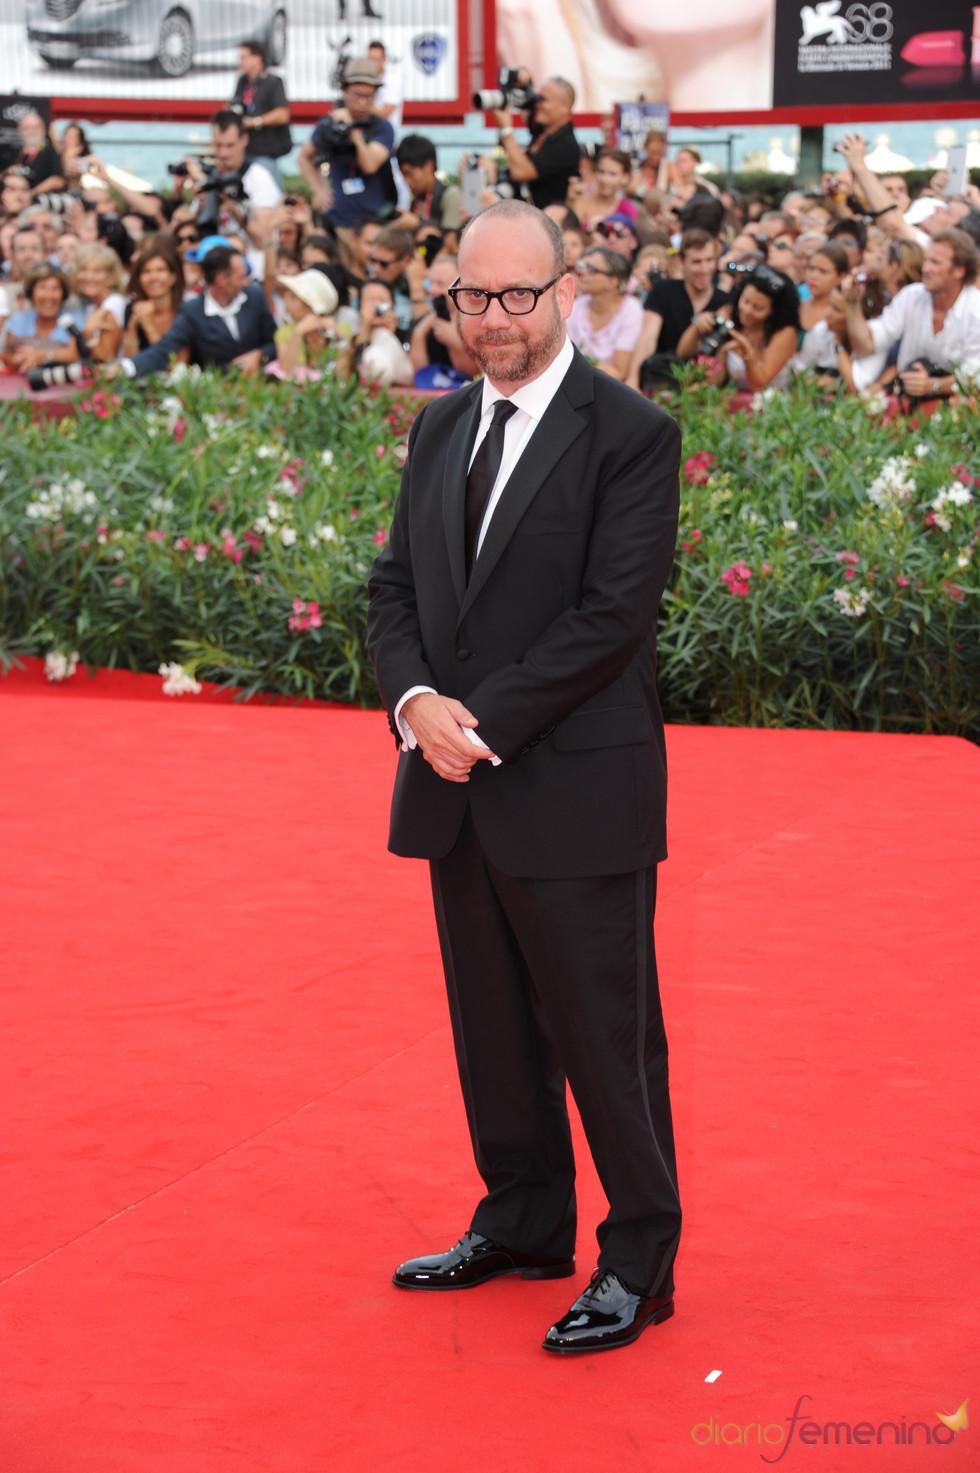 Paul Giamatti llega a la alfombra roja del Festival de Cine de Venecia